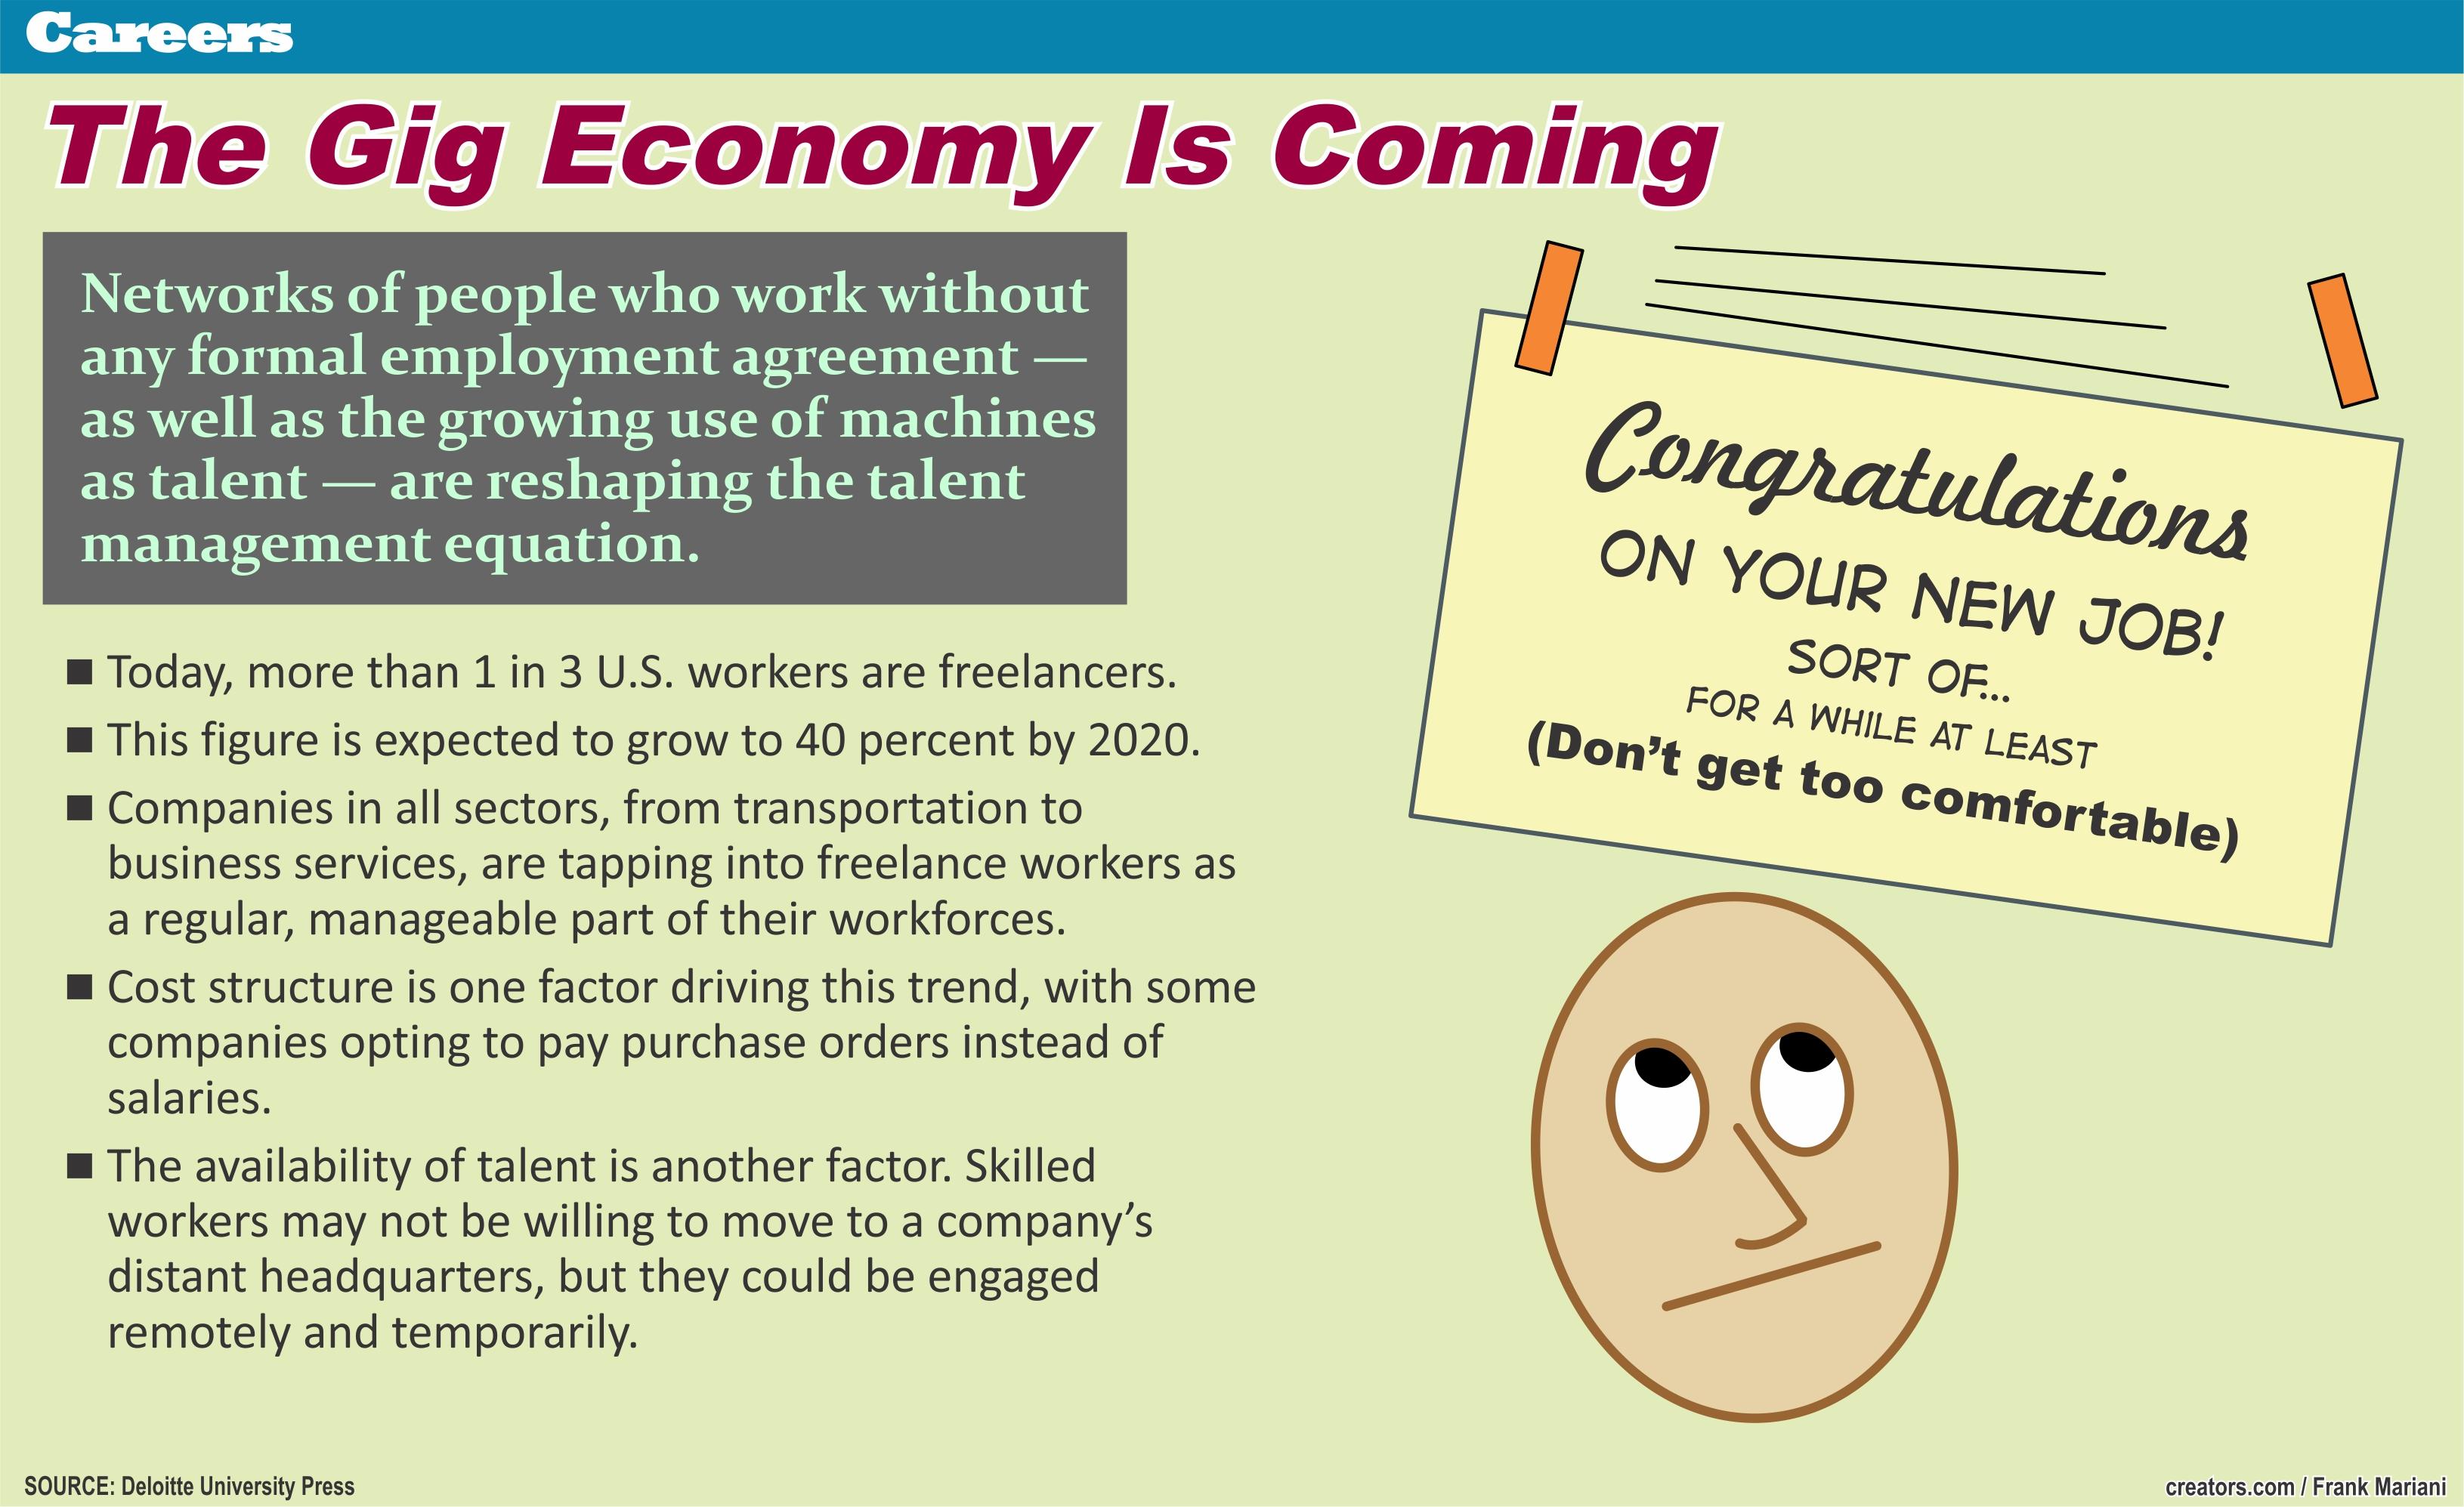 Career Info 1